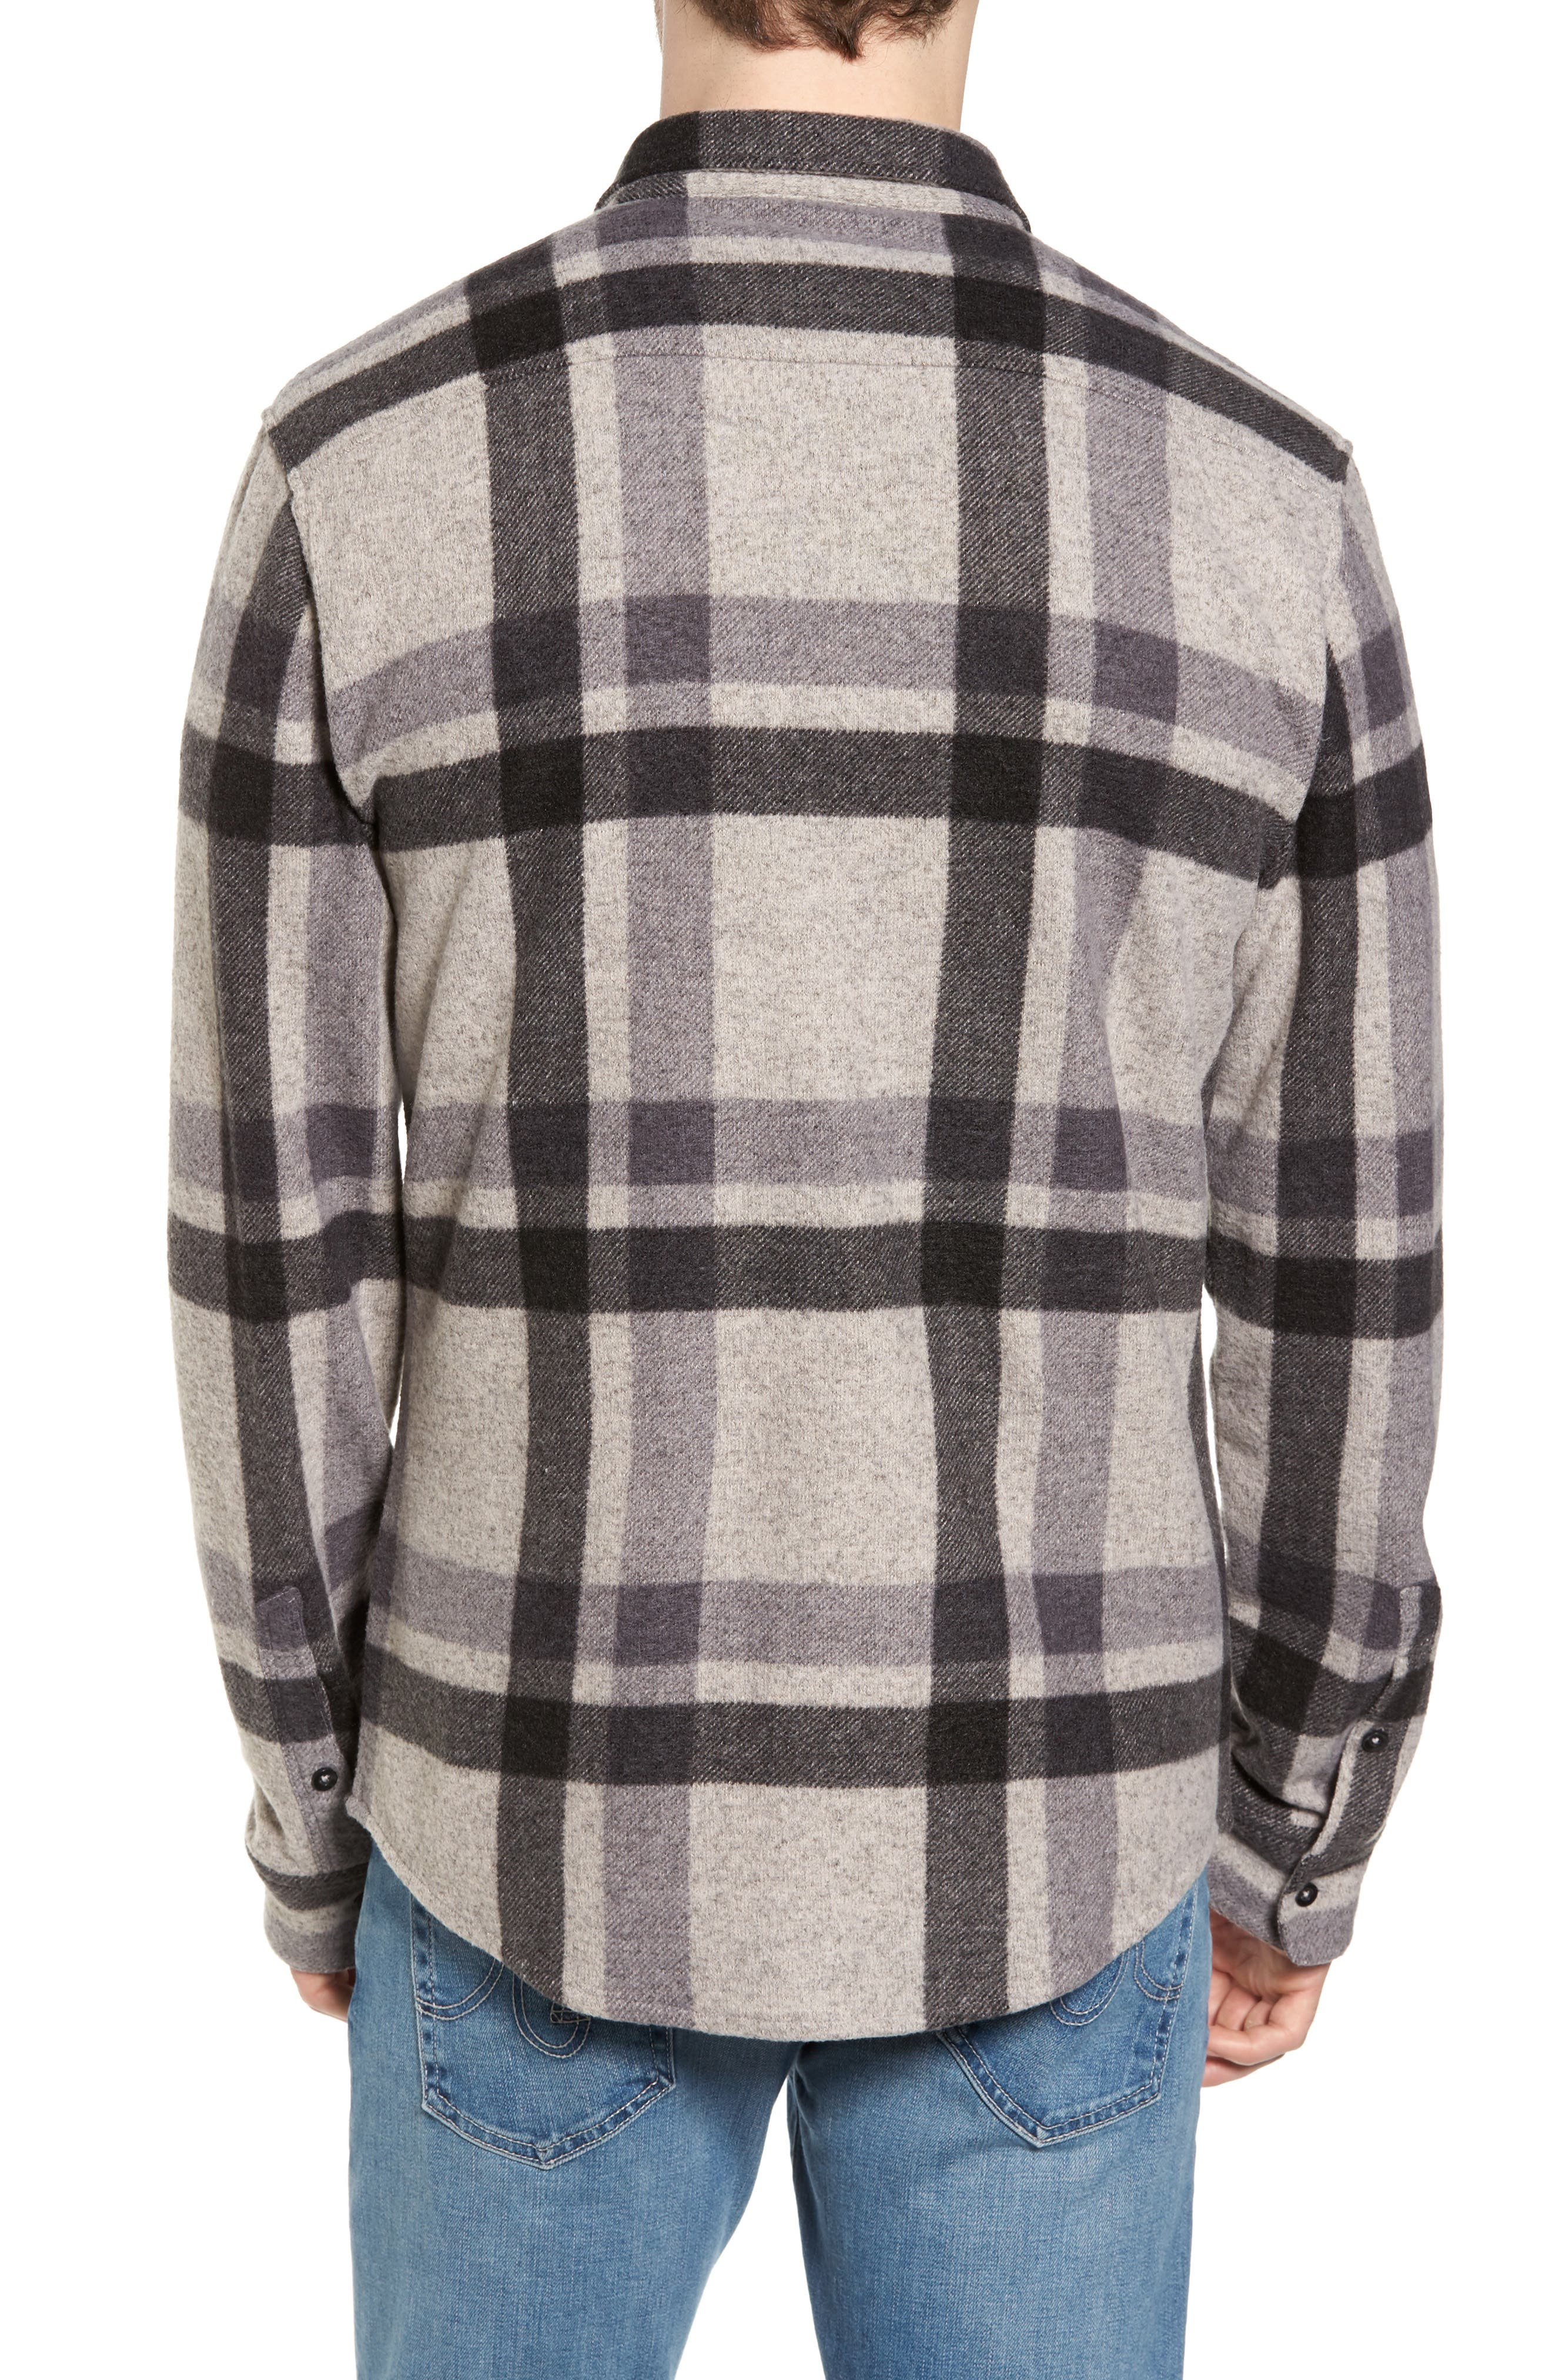 Plaid Shirt,                             Alternate thumbnail 2, color,                             Grey Charcoal Large Plaid